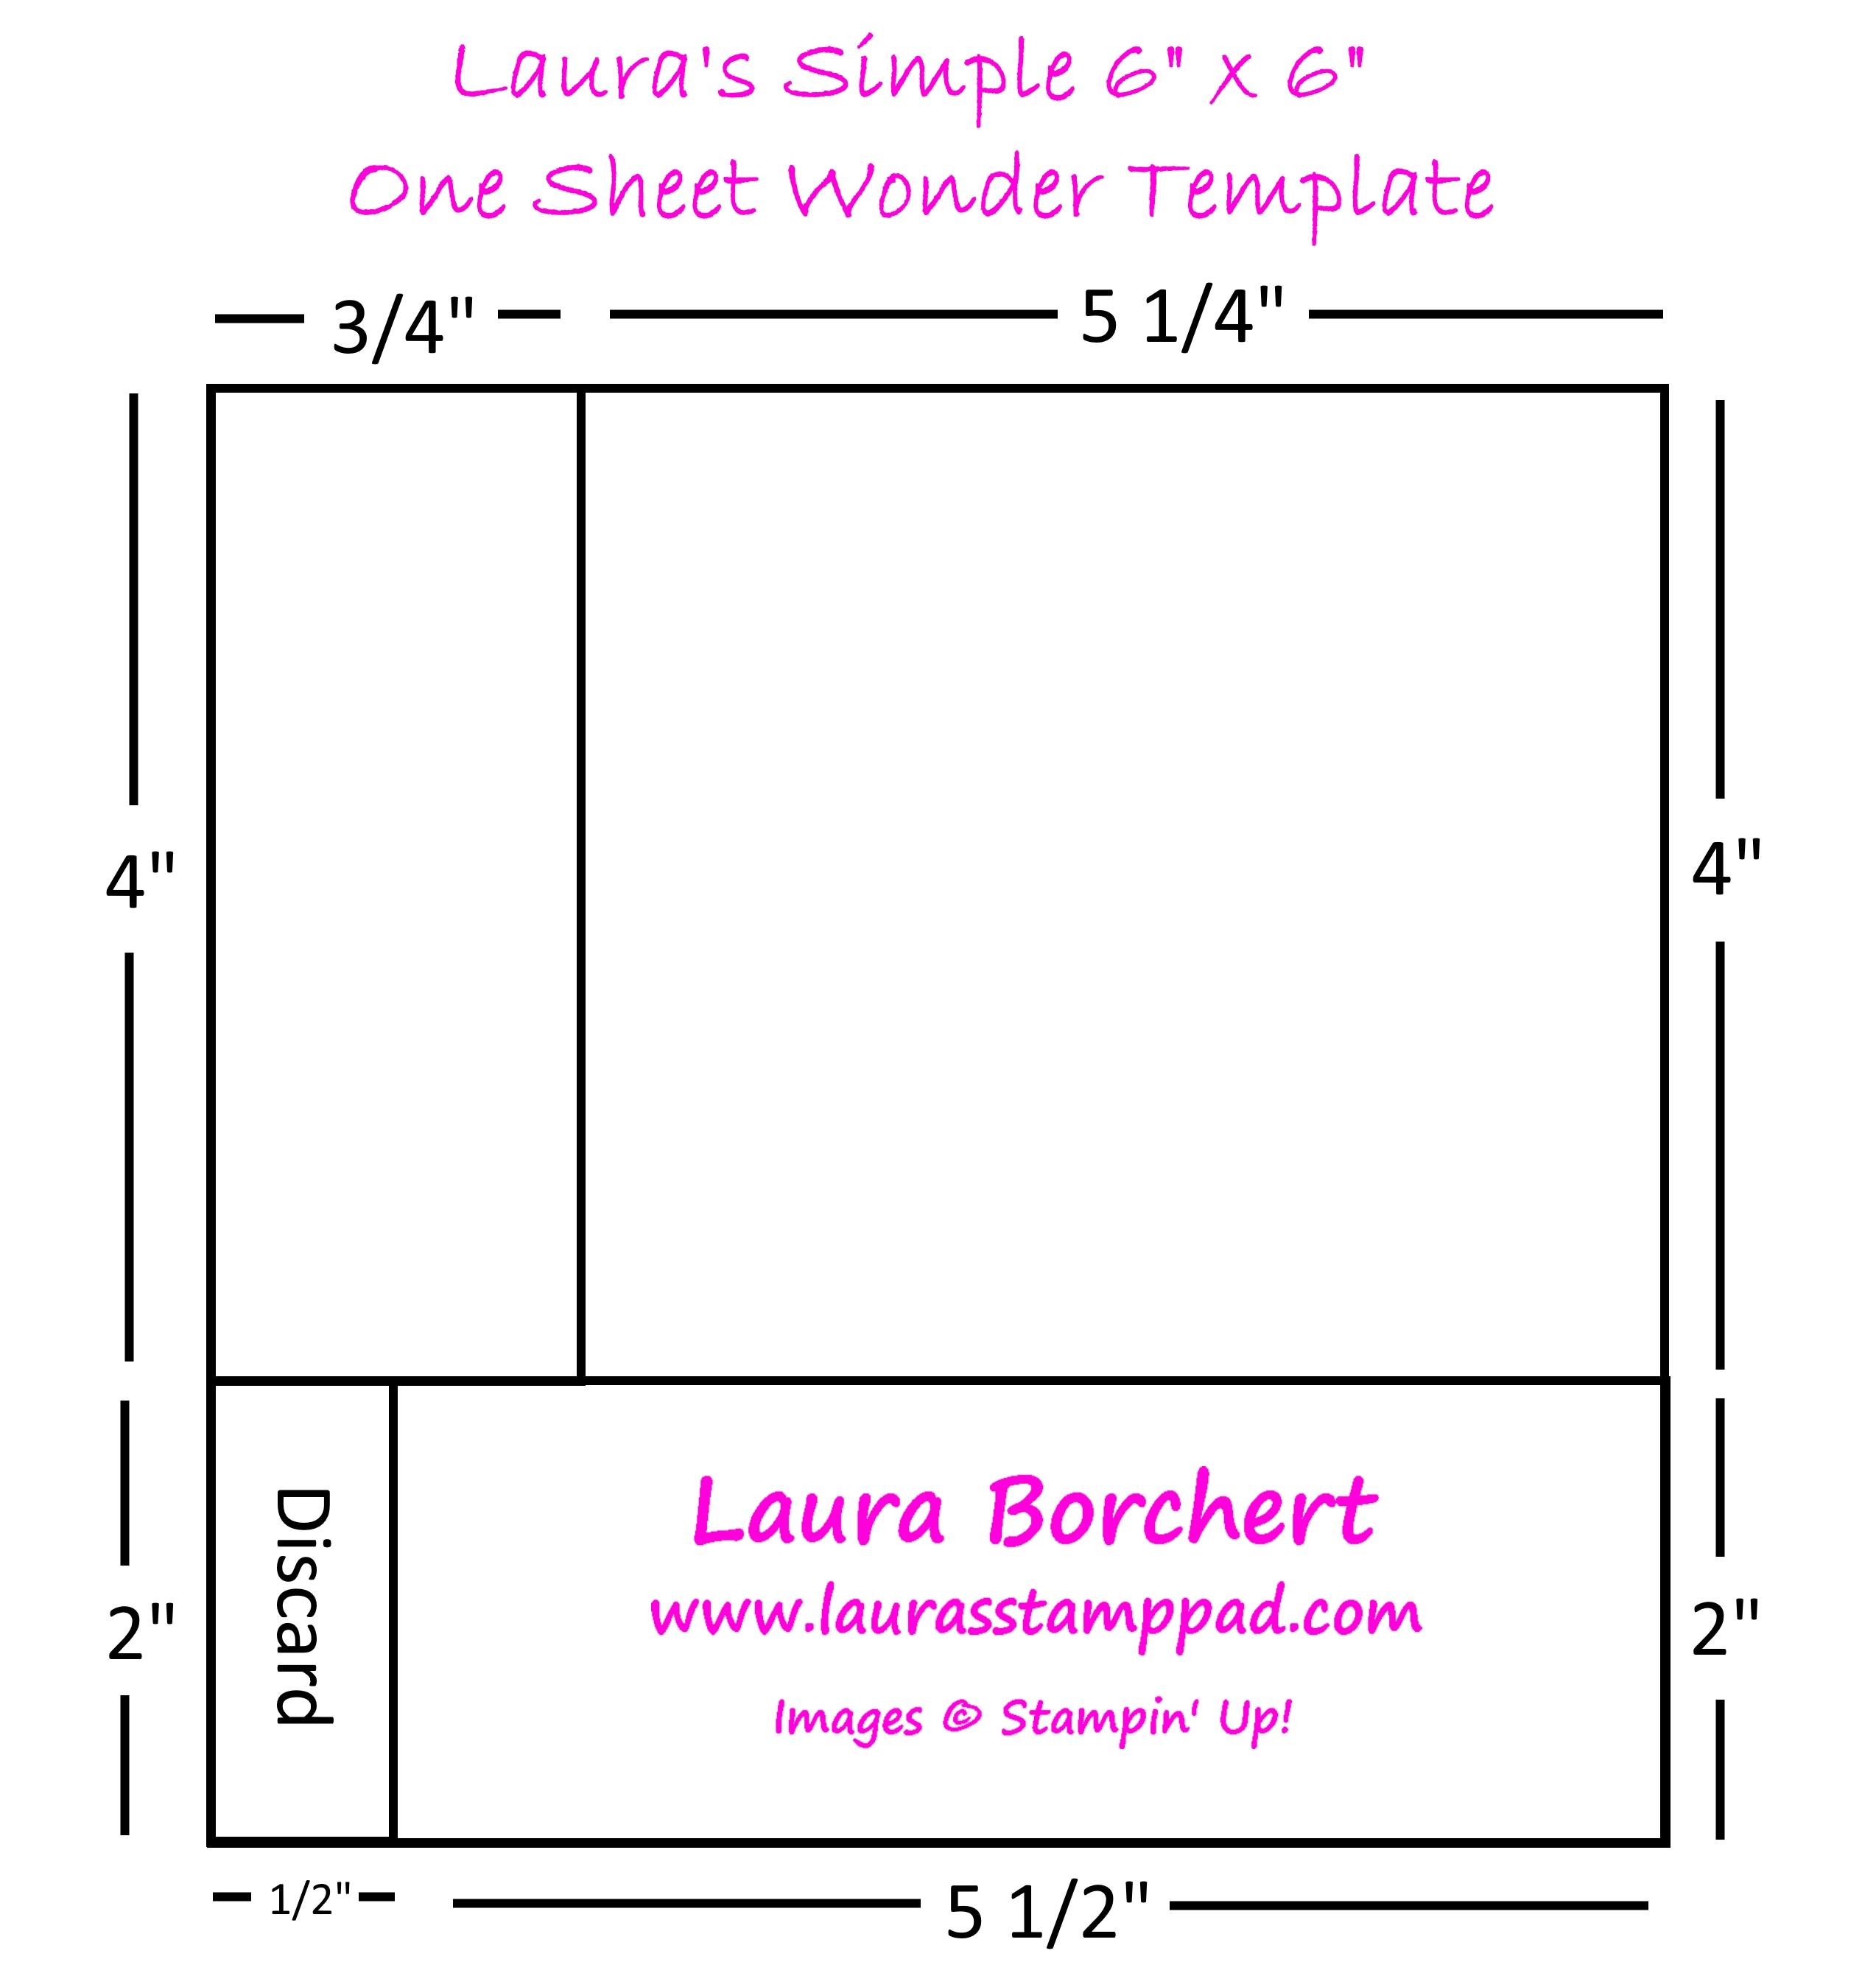 One Sheet Wonder Archives - Laura's Stamp PadLaura's Stamp Pad - photo#13